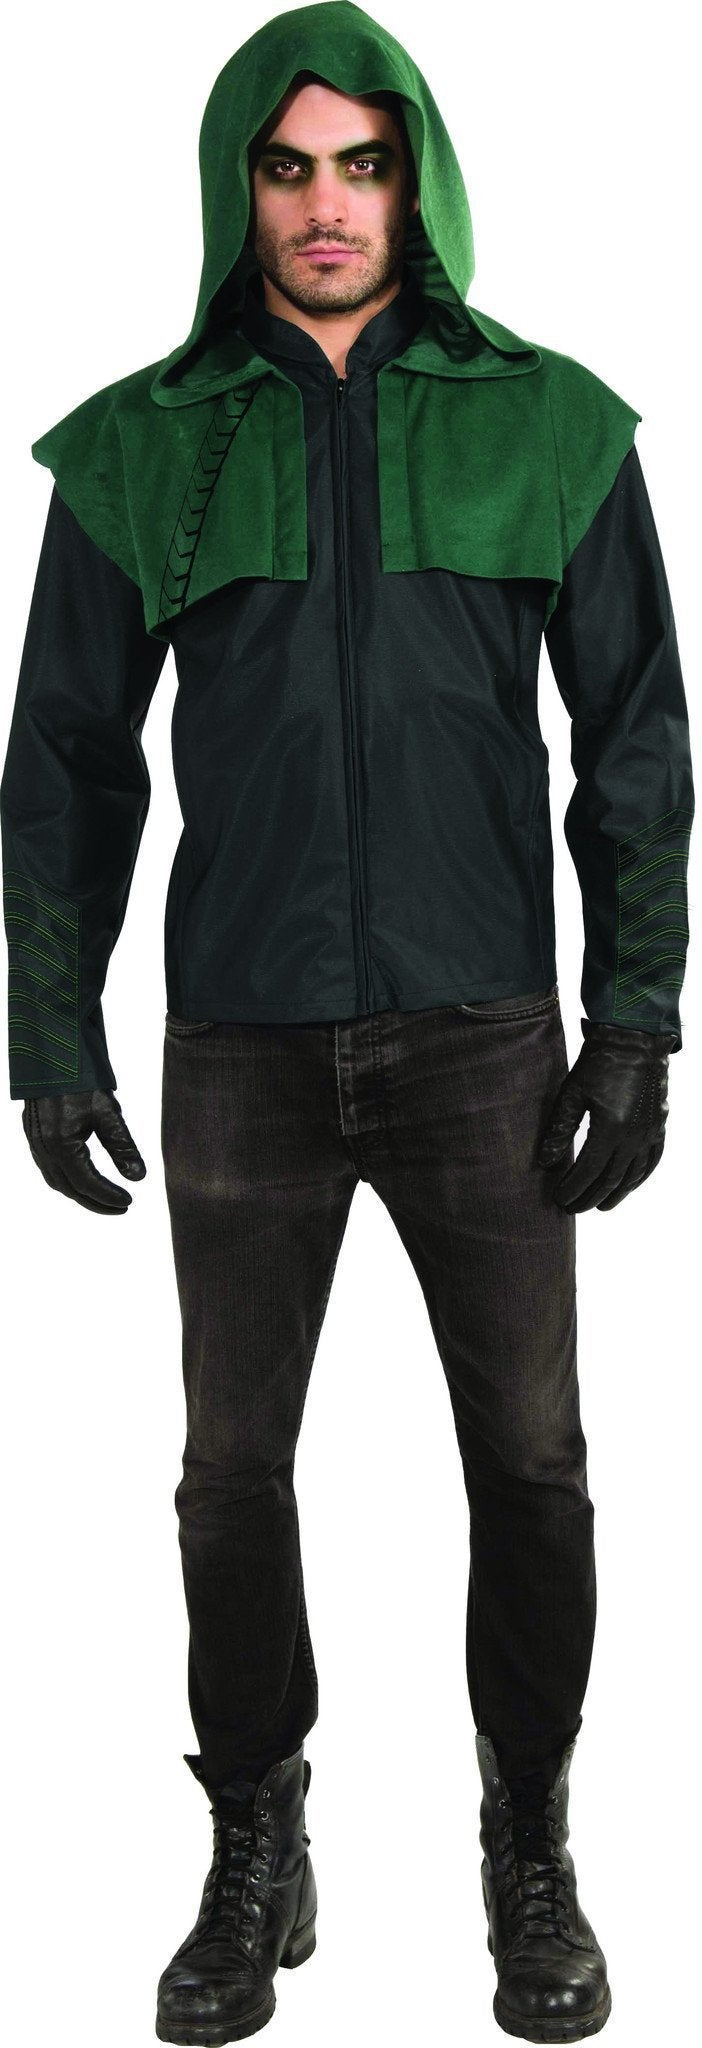 Arrow Deluxe Costume for Adults - Warner Bros DC Comics